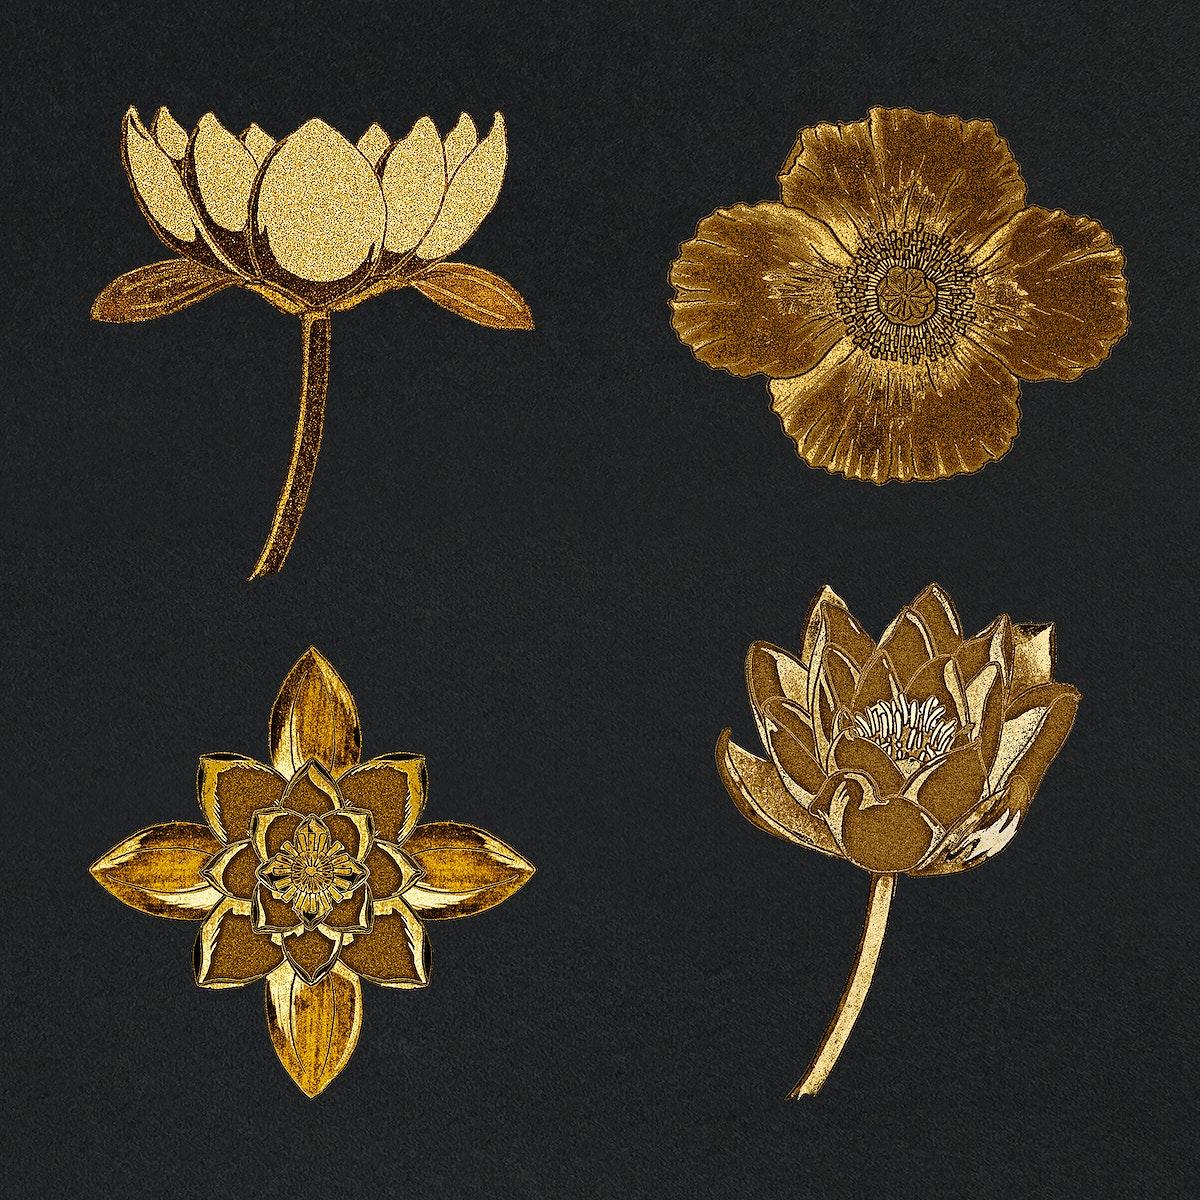 Vintage gold water lily and poppy flower illustration set design element